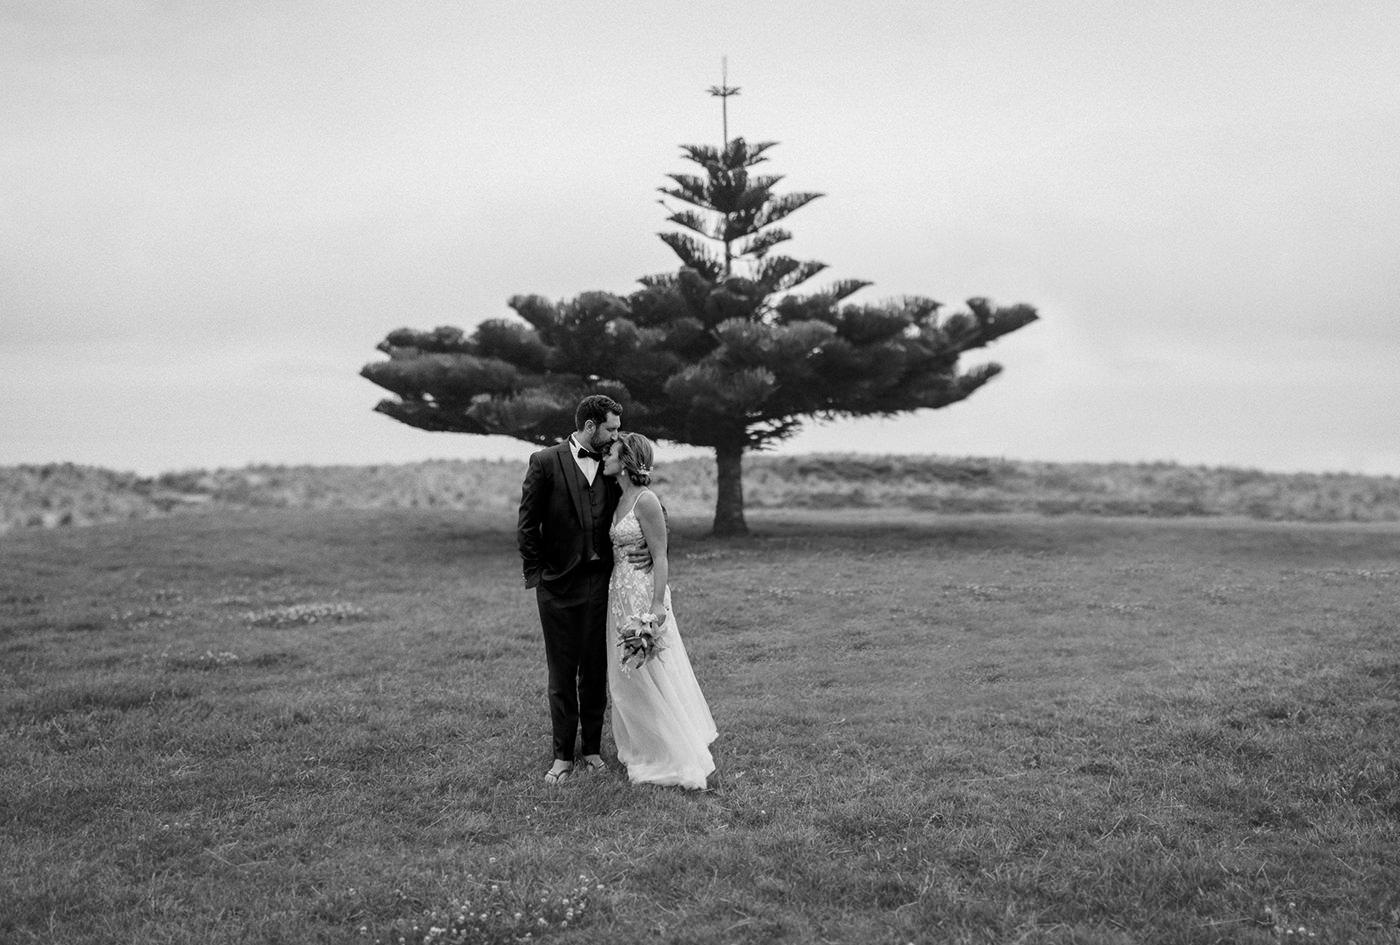 wedding_photographer_nz-00056.jpg